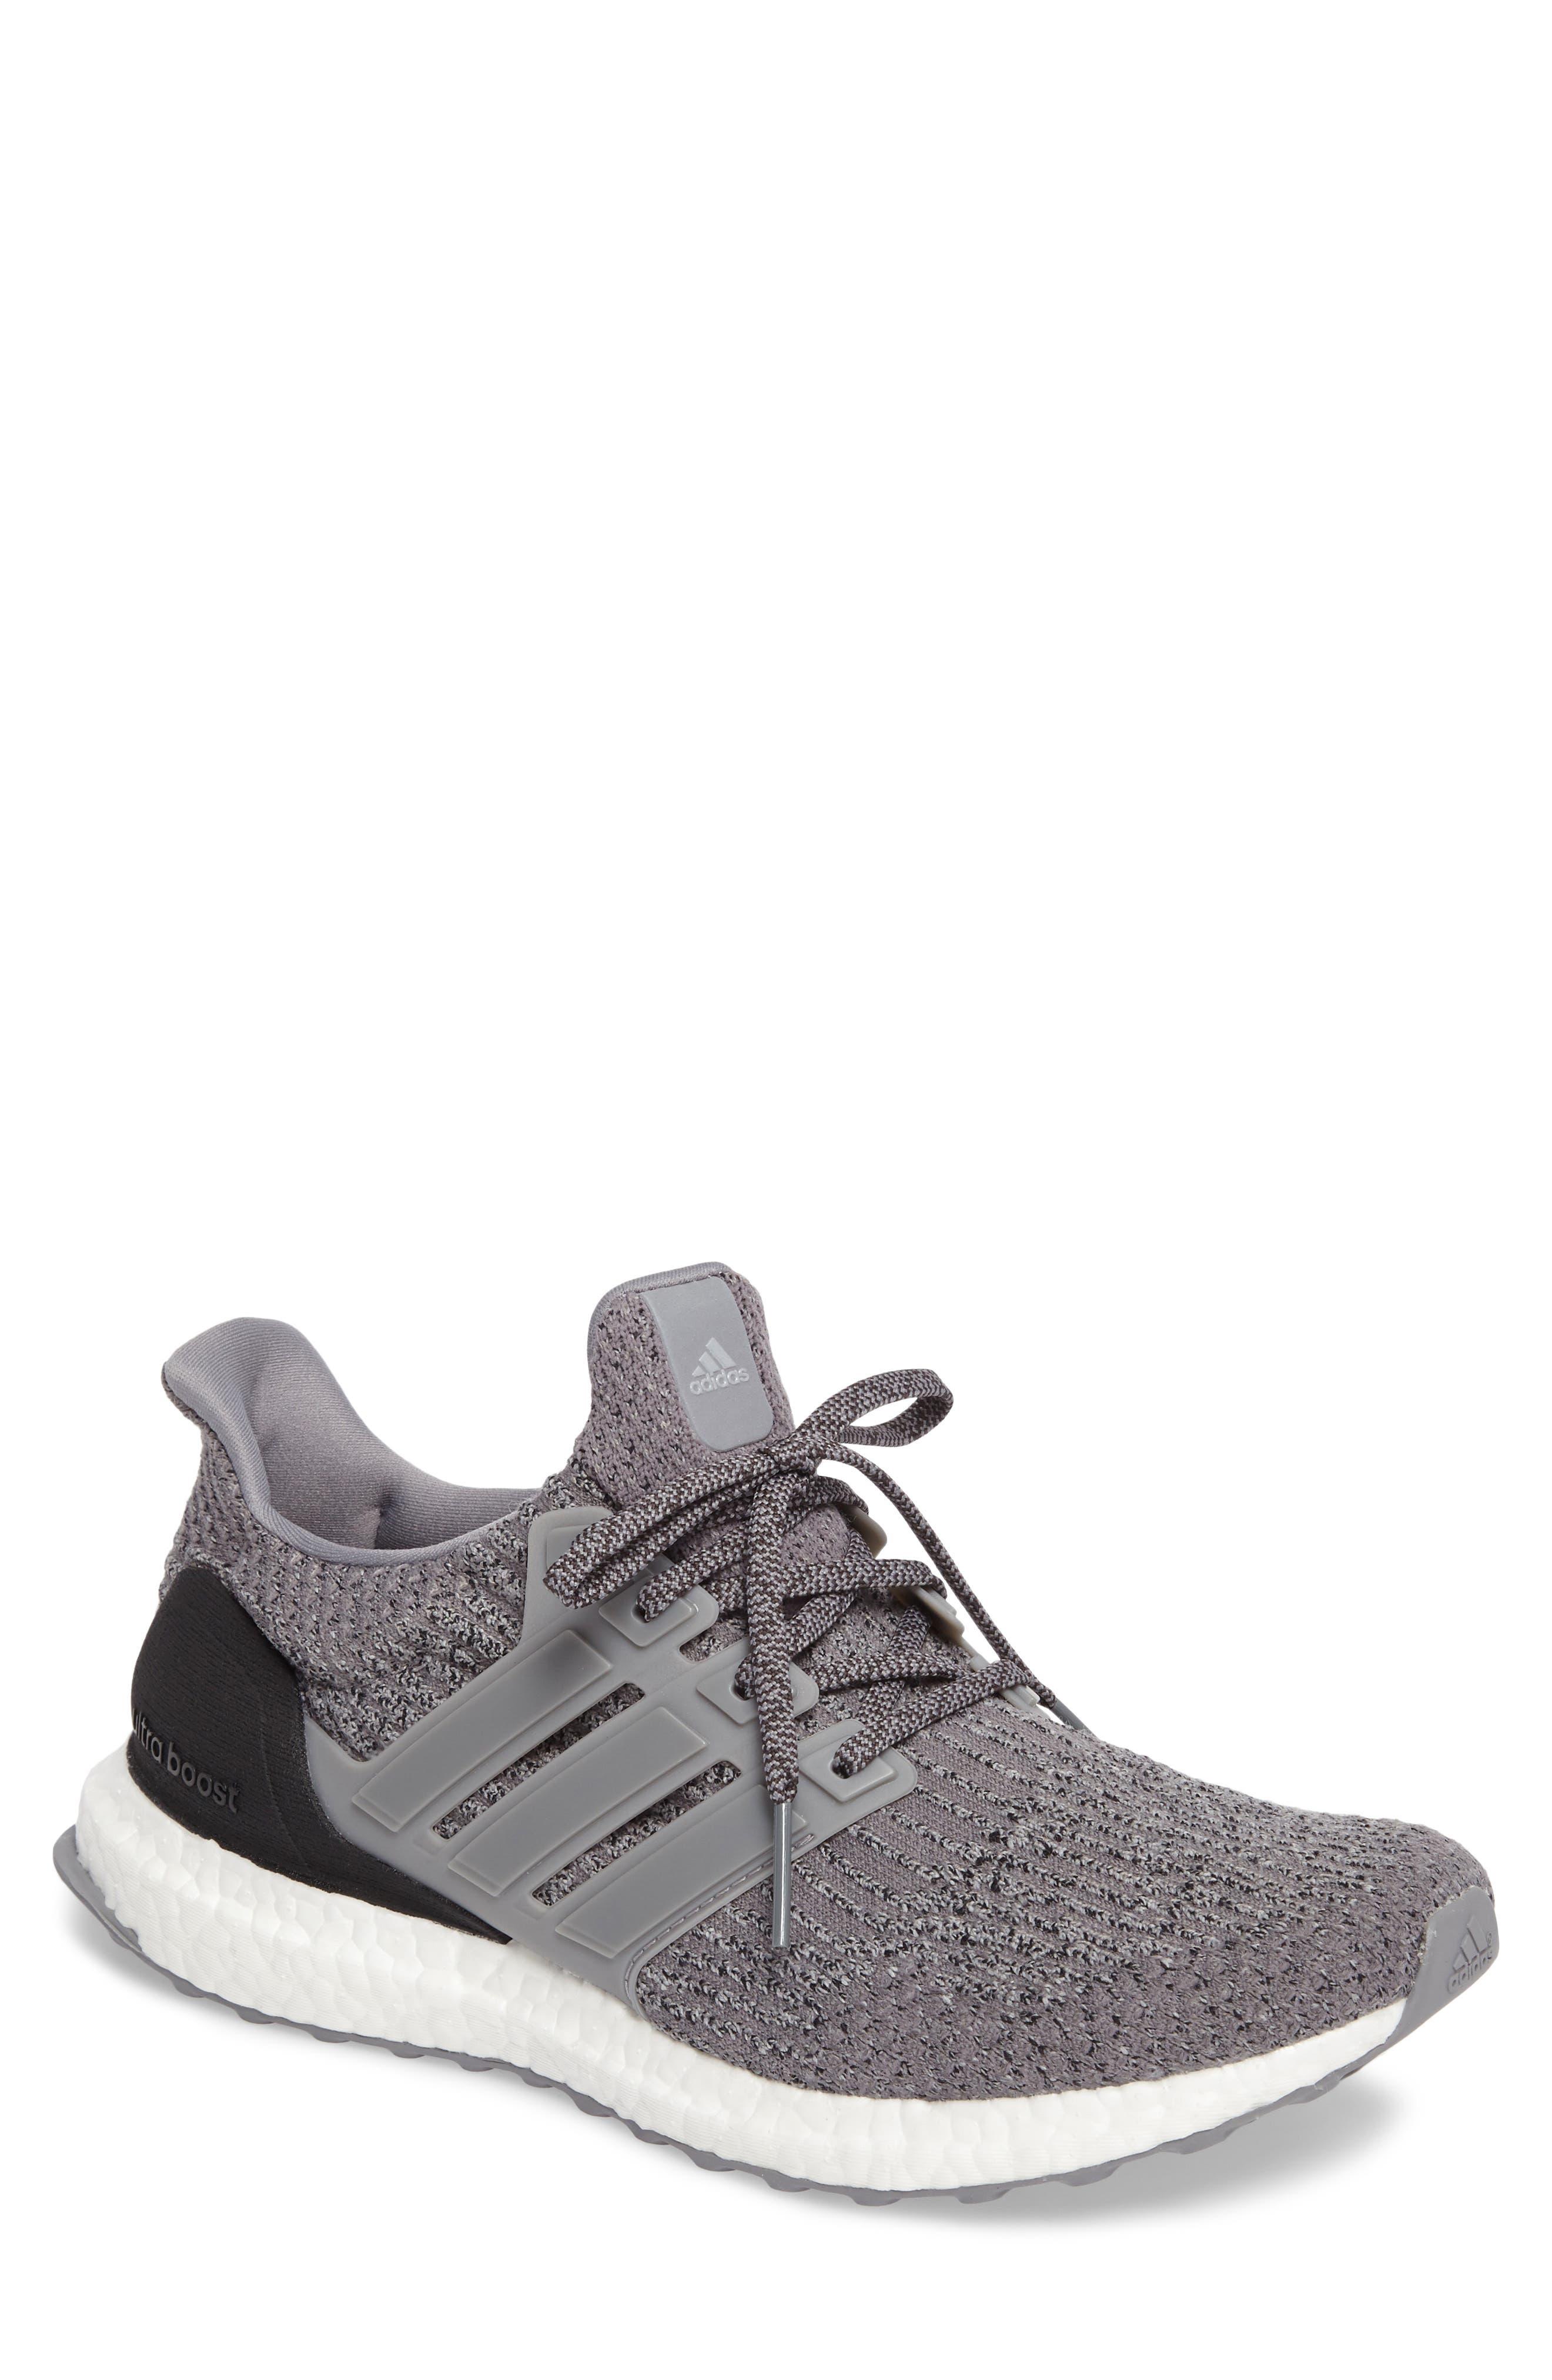 Main Image - adidas 'UltraBoost' Running Shoe (Men)